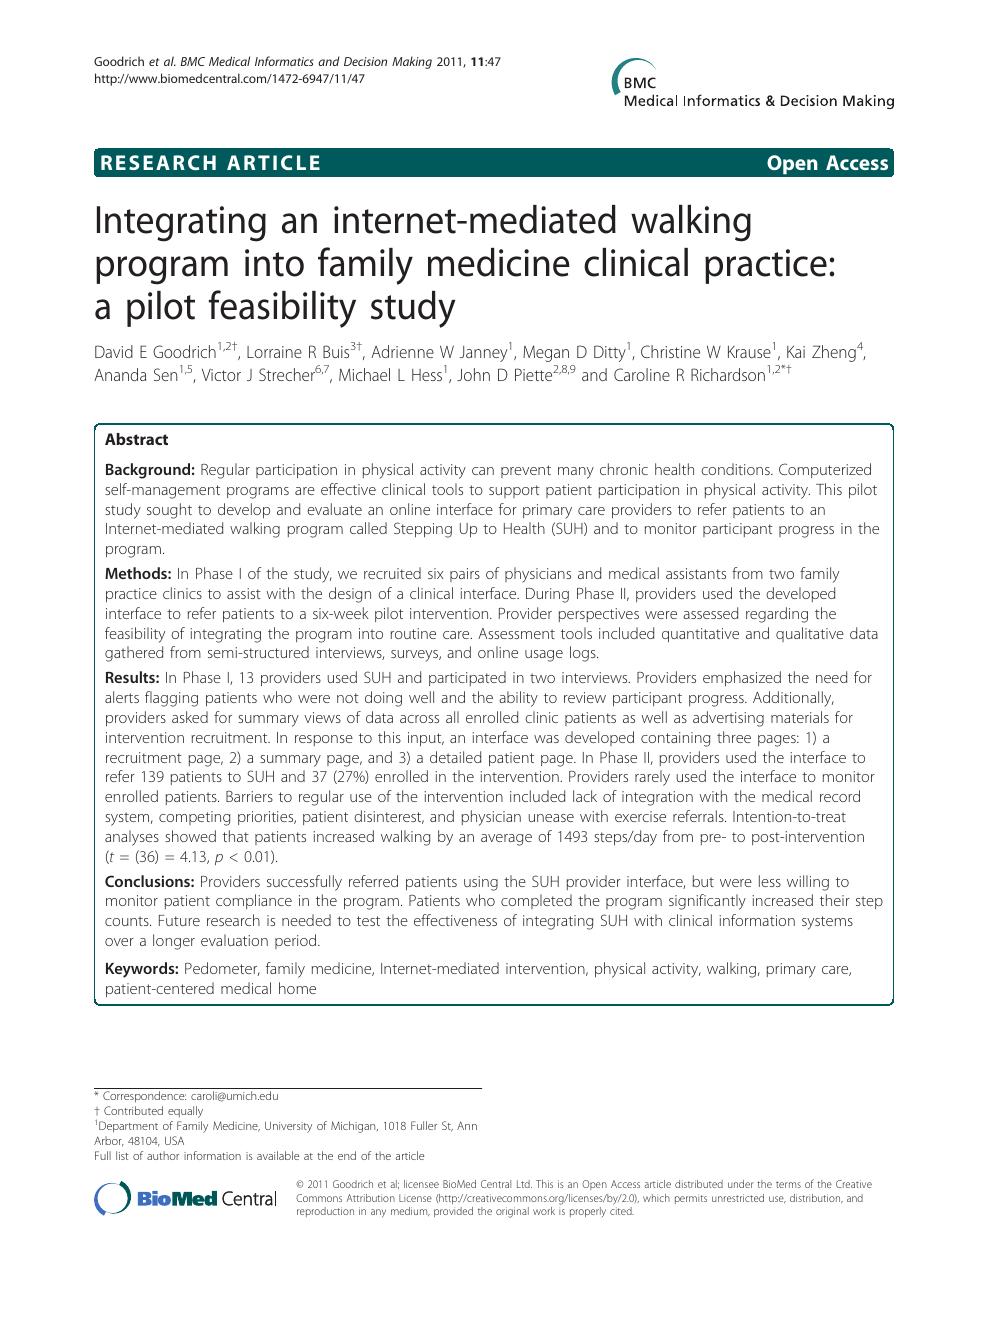 Integrating an internet mediated walking program into family